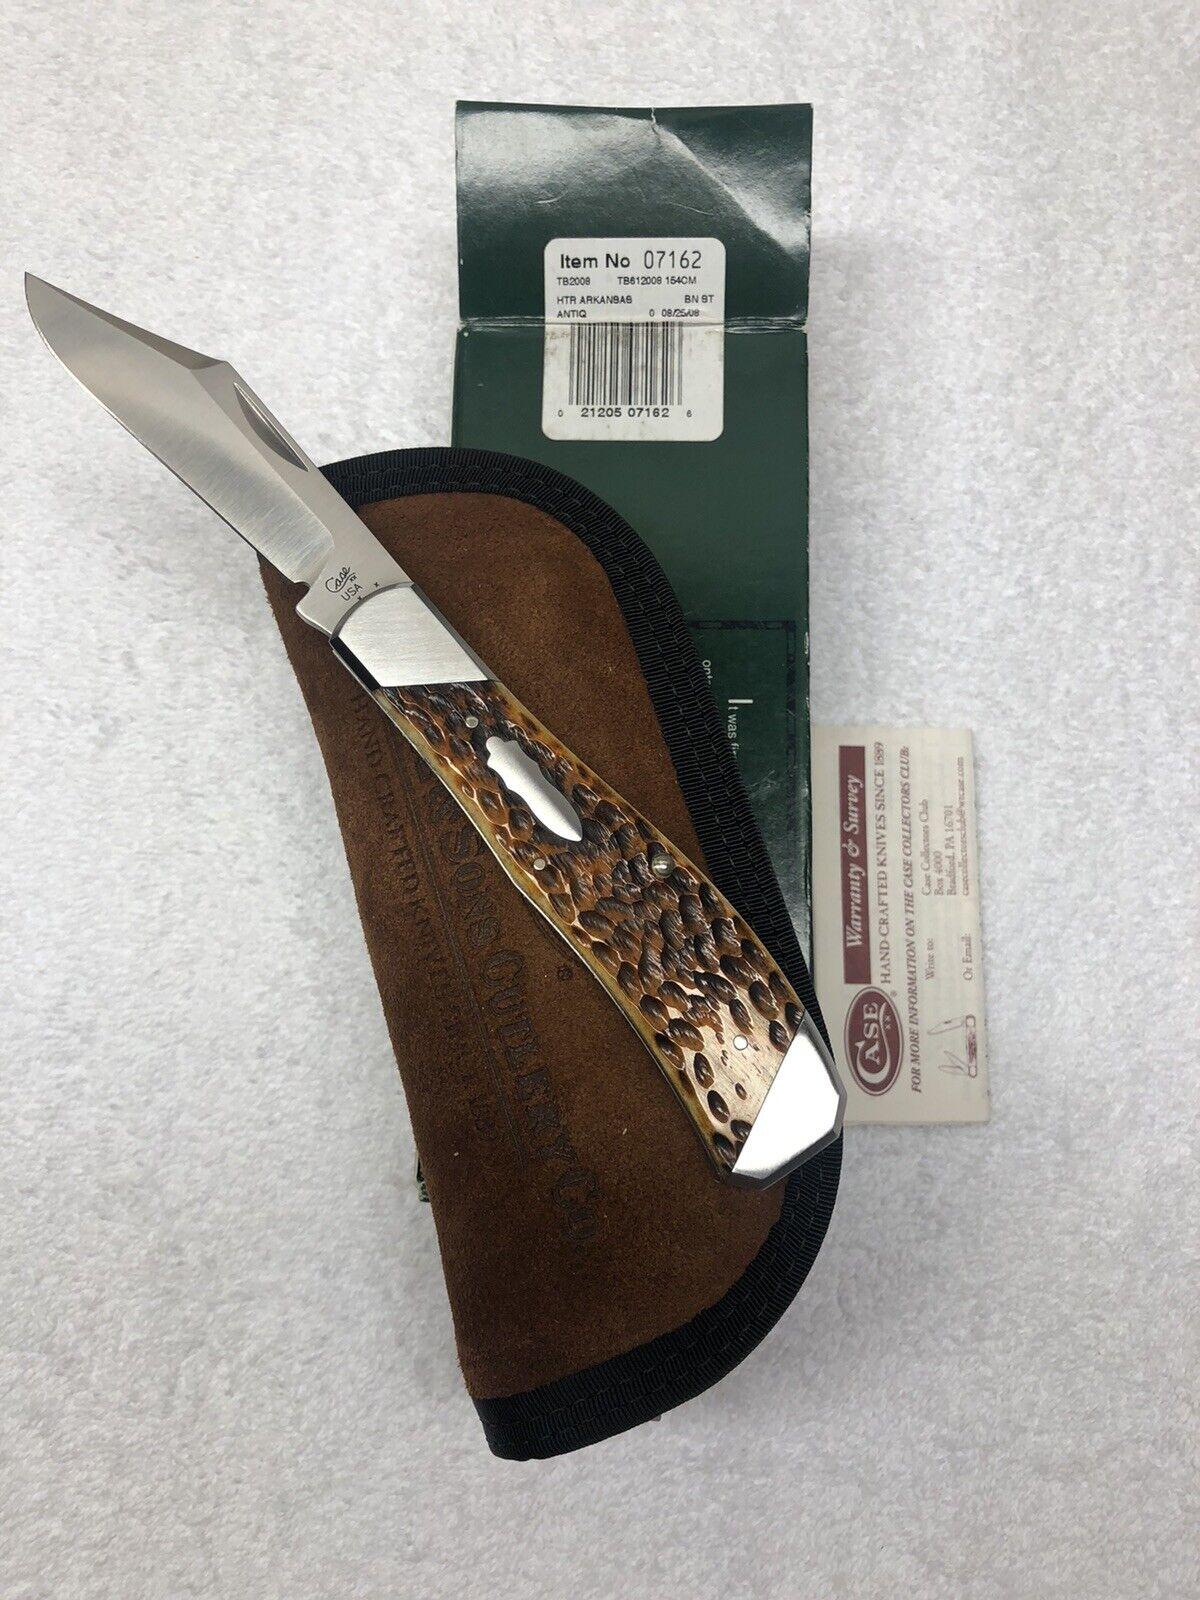 Case XX / Tony Bose Collaboration Knife 2008 Ltd. Ed Arkansas Hunter #07162 TB61